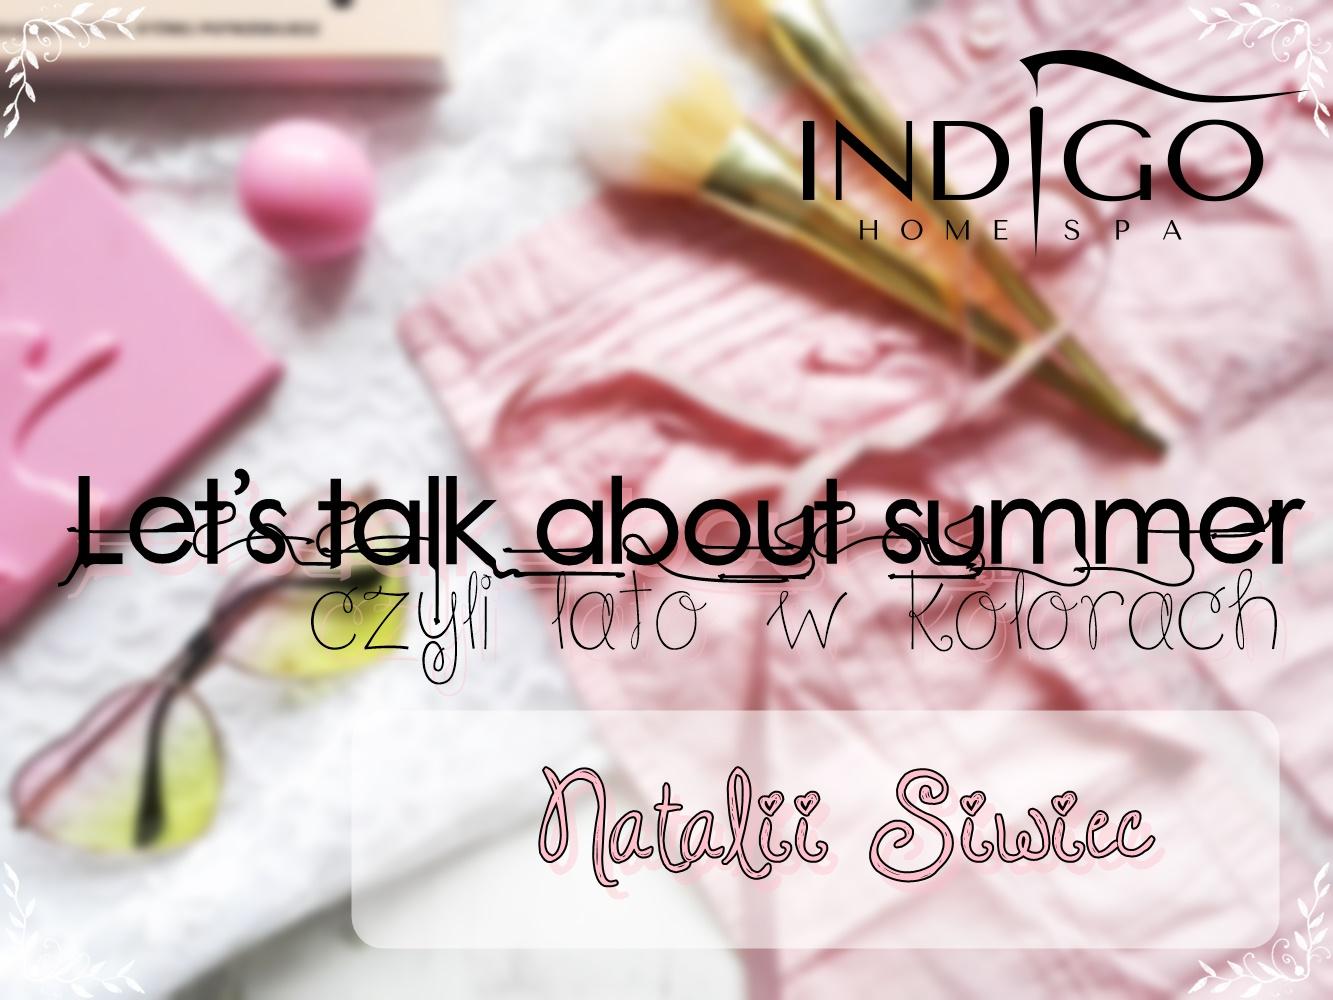 Let's talk about summer, czyli lato w kolorach Natalii Siwiec